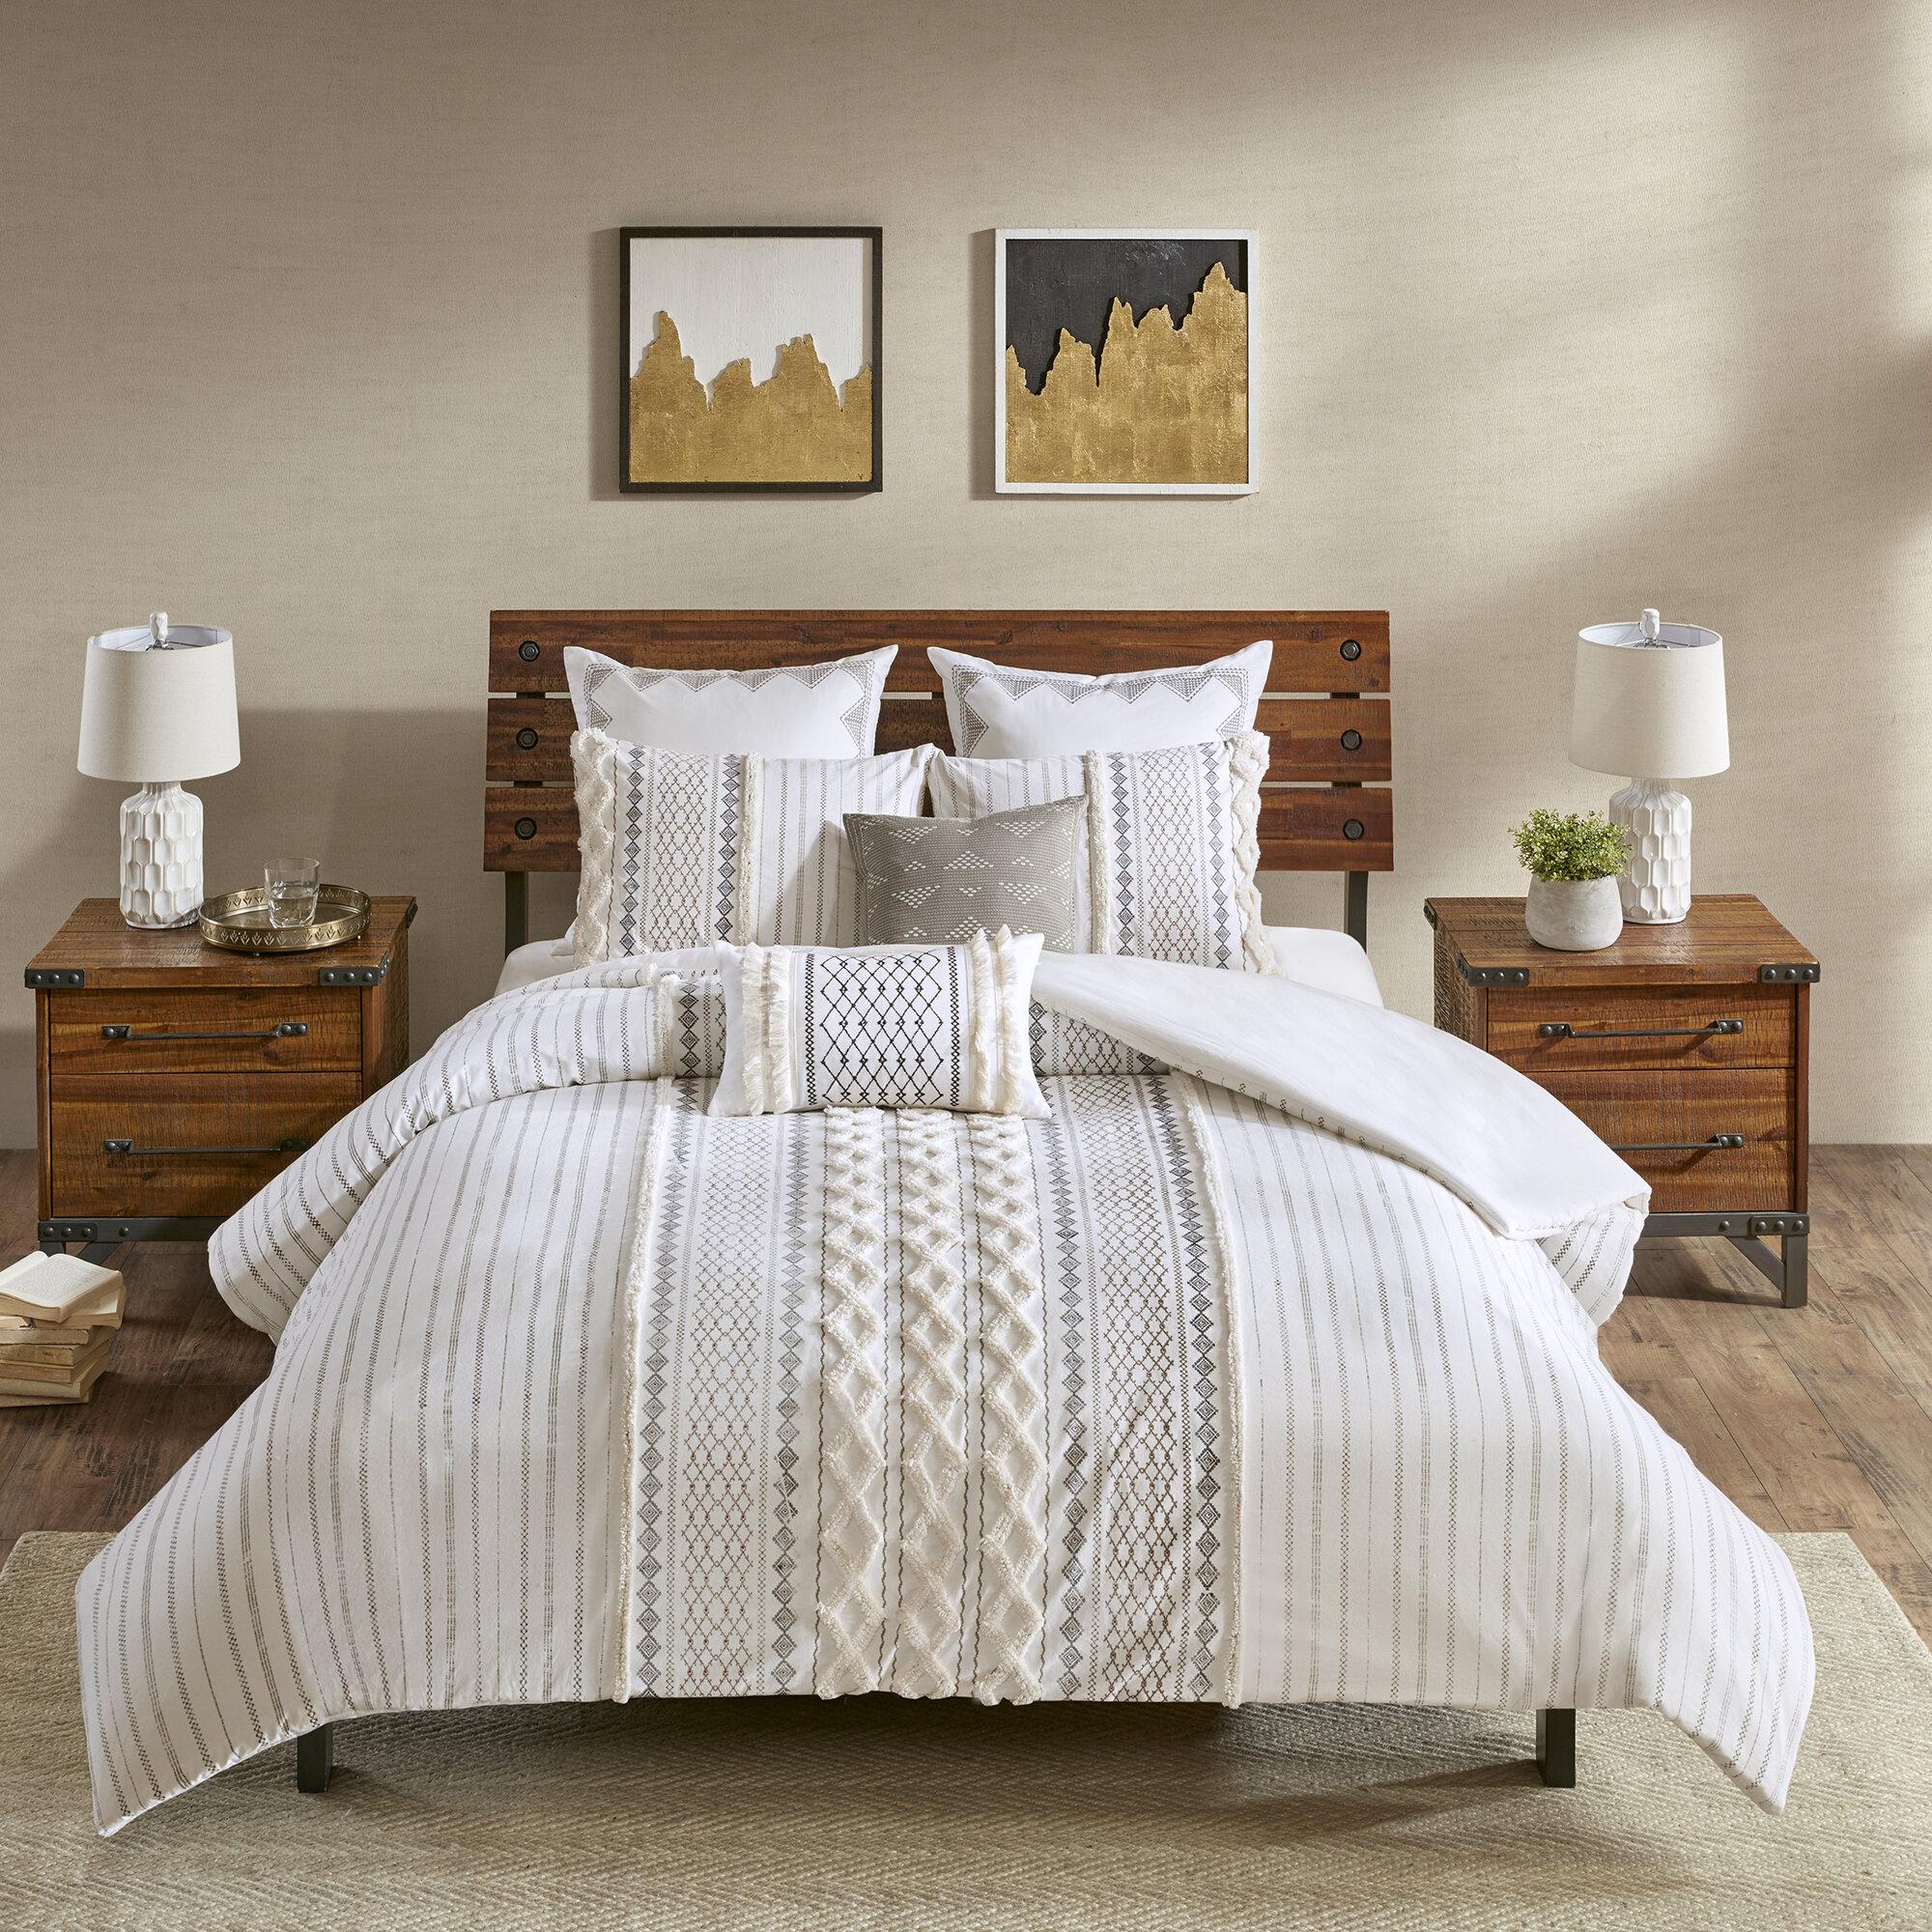 Bedding Home Furniture Diy Single Bed Duvet Quilt Cover Bedding Sets Plain Red Blue Chocolate Brown 3 Tone Zigndigital No